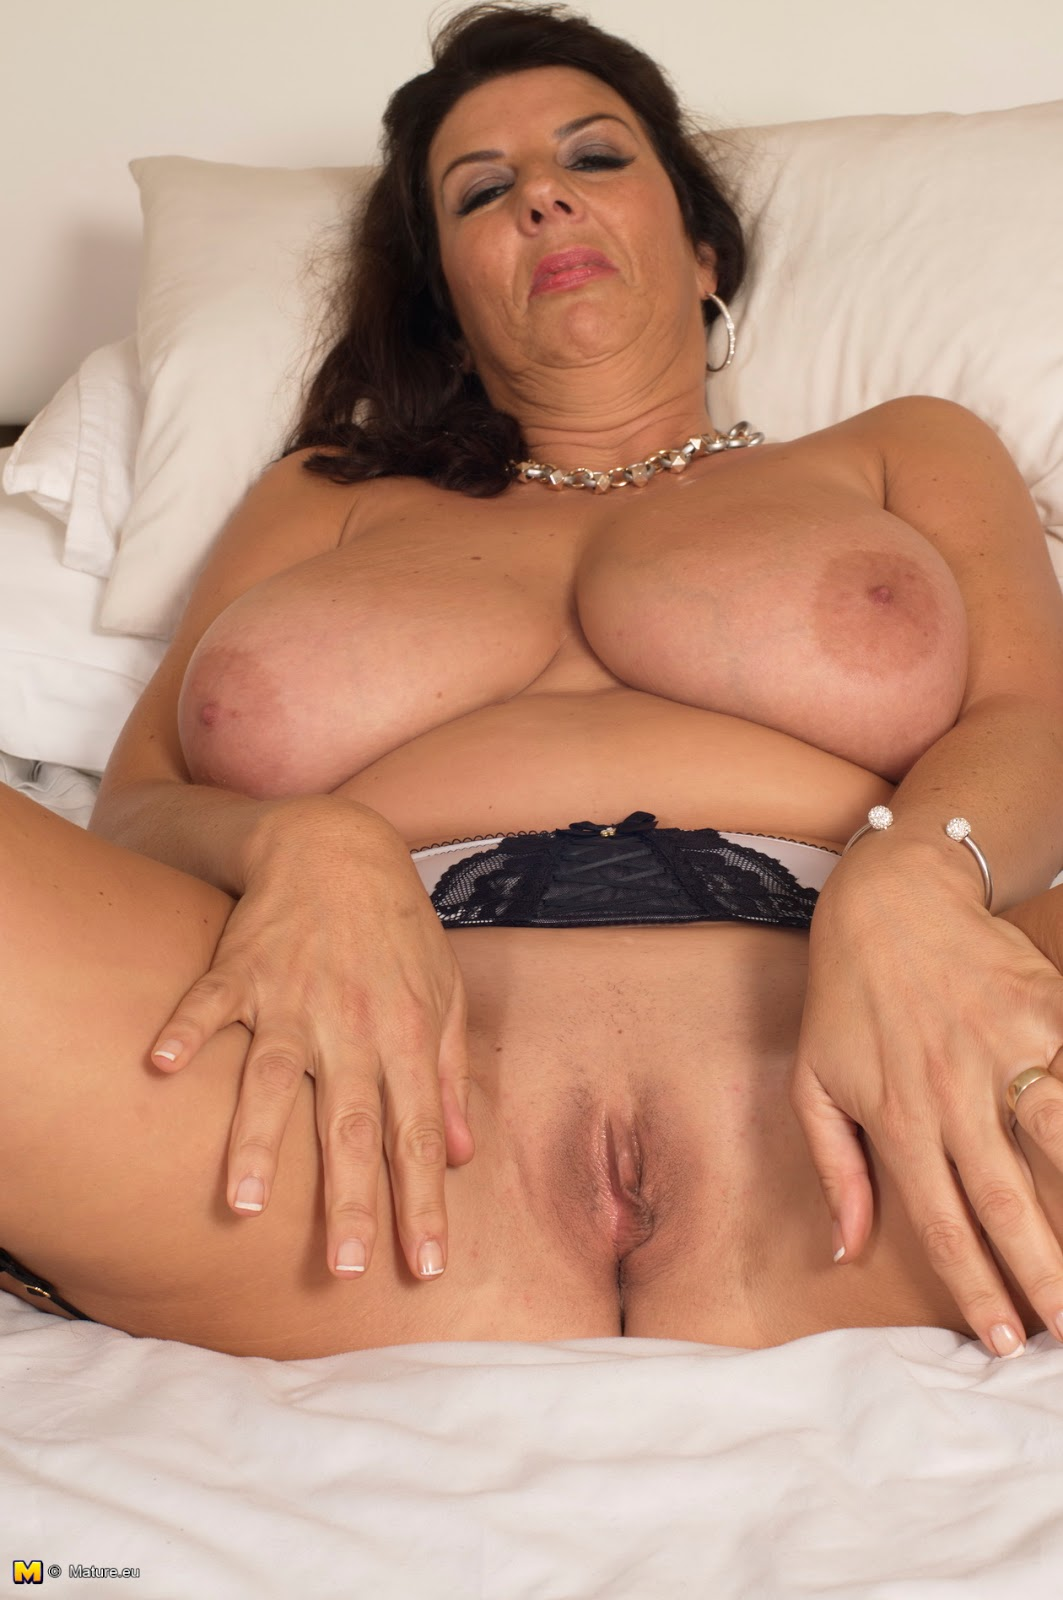 Nude zulu girls pics